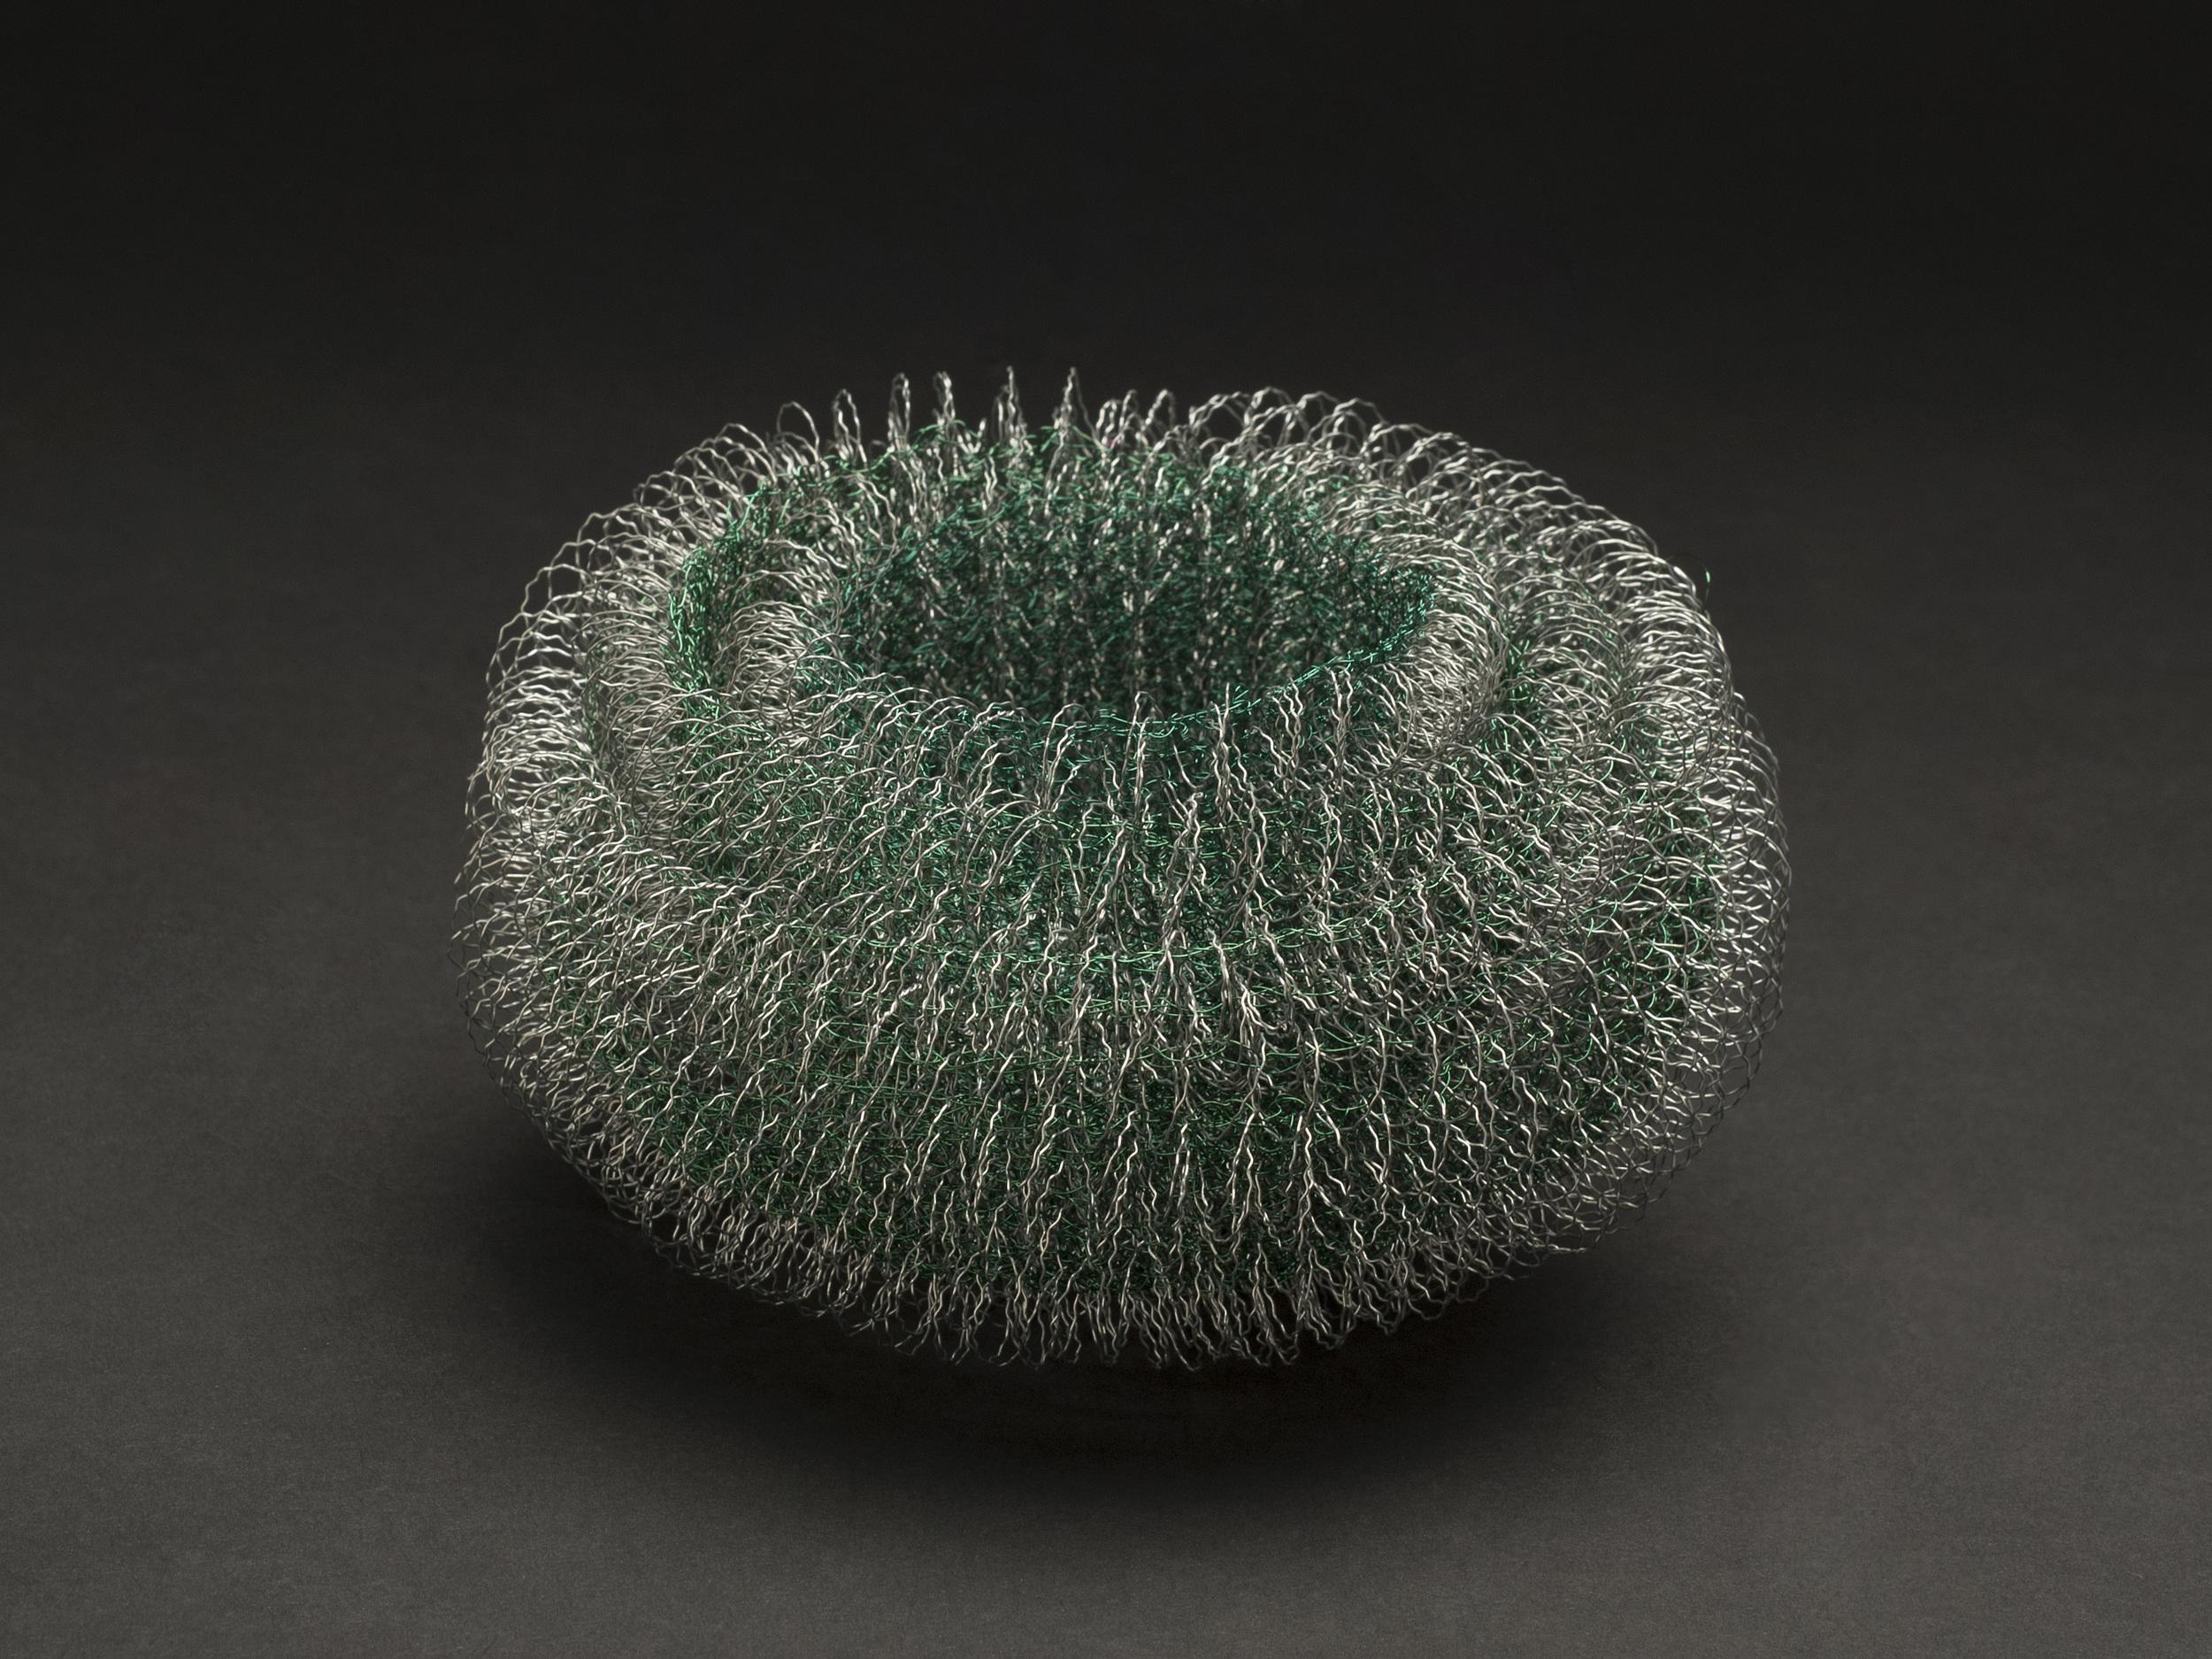 Mieko Kawase    Green Light  , 2012 Wire 3.94 x 5.91 x 5.91 inches / 10 x 15 x 15 cm / MKe 6